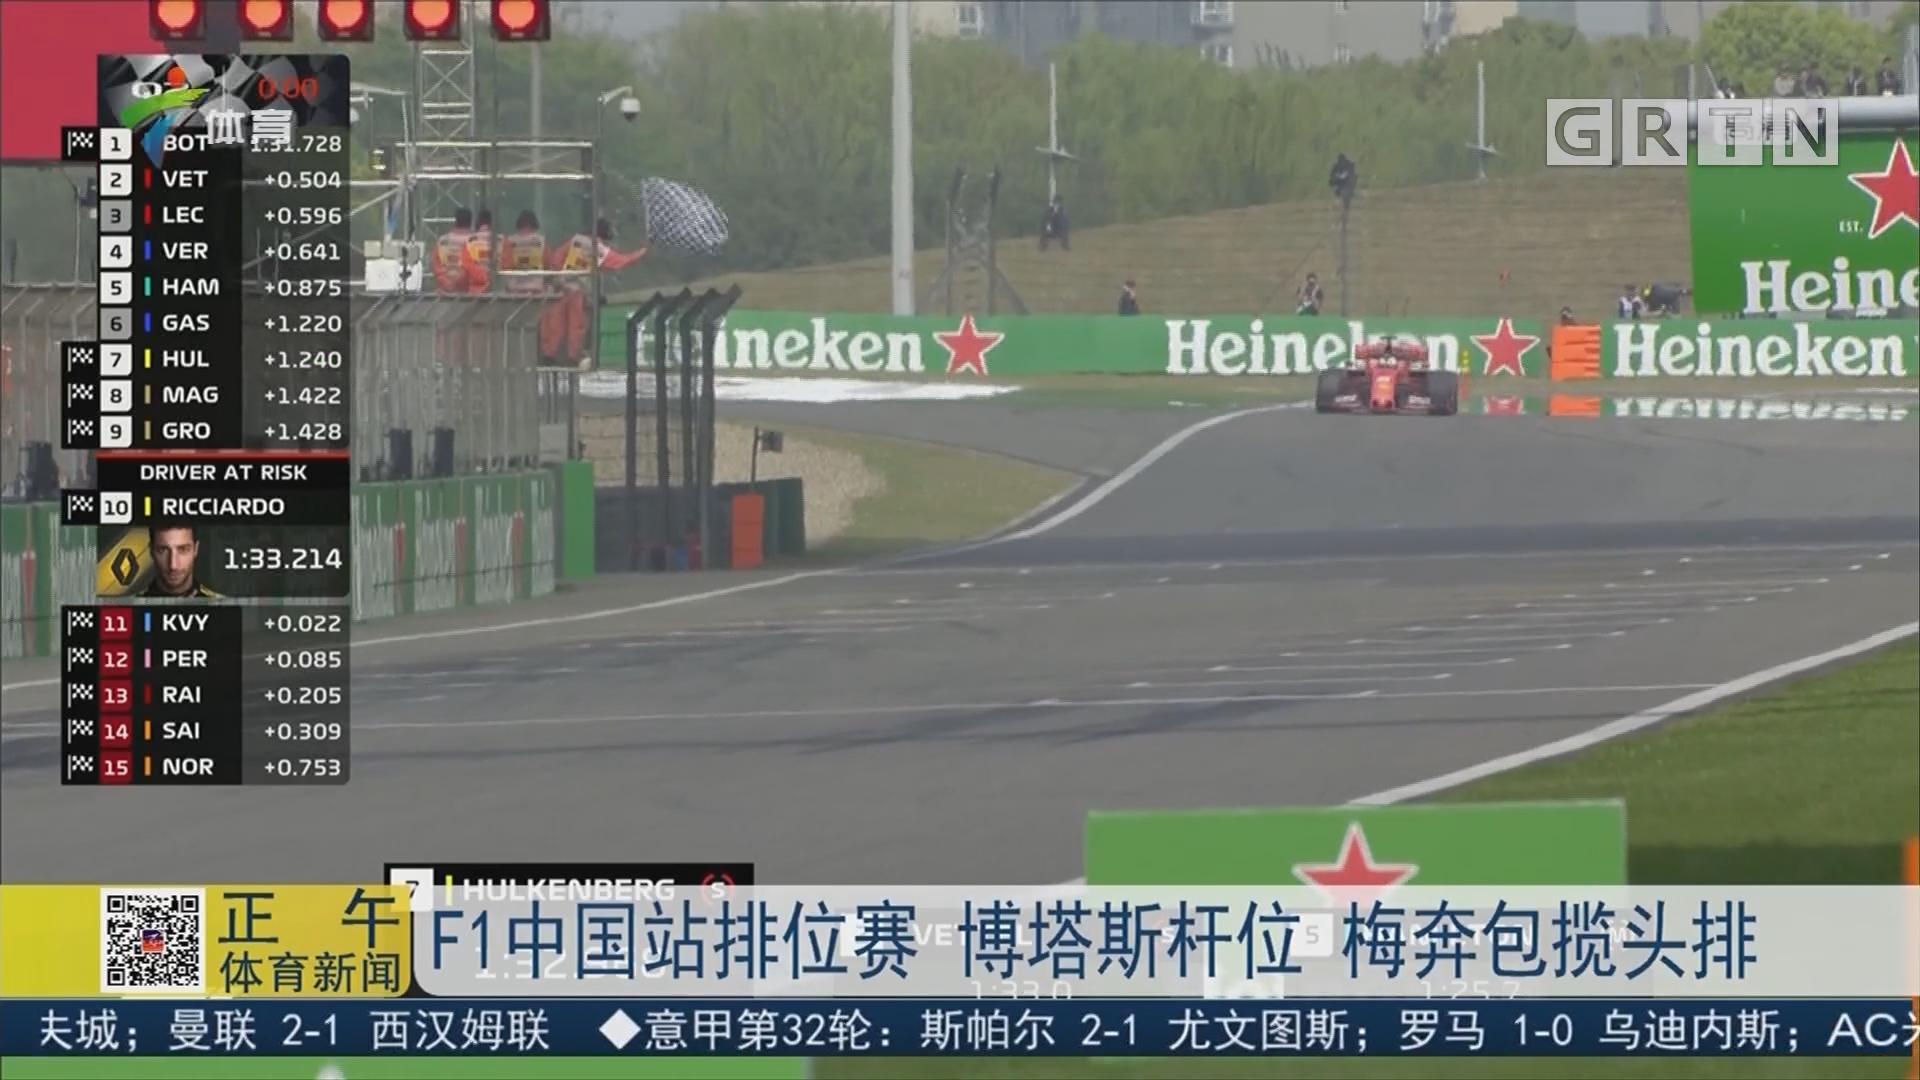 F1中国站排位赛 博塔斯杆位 梅奔包揽头排